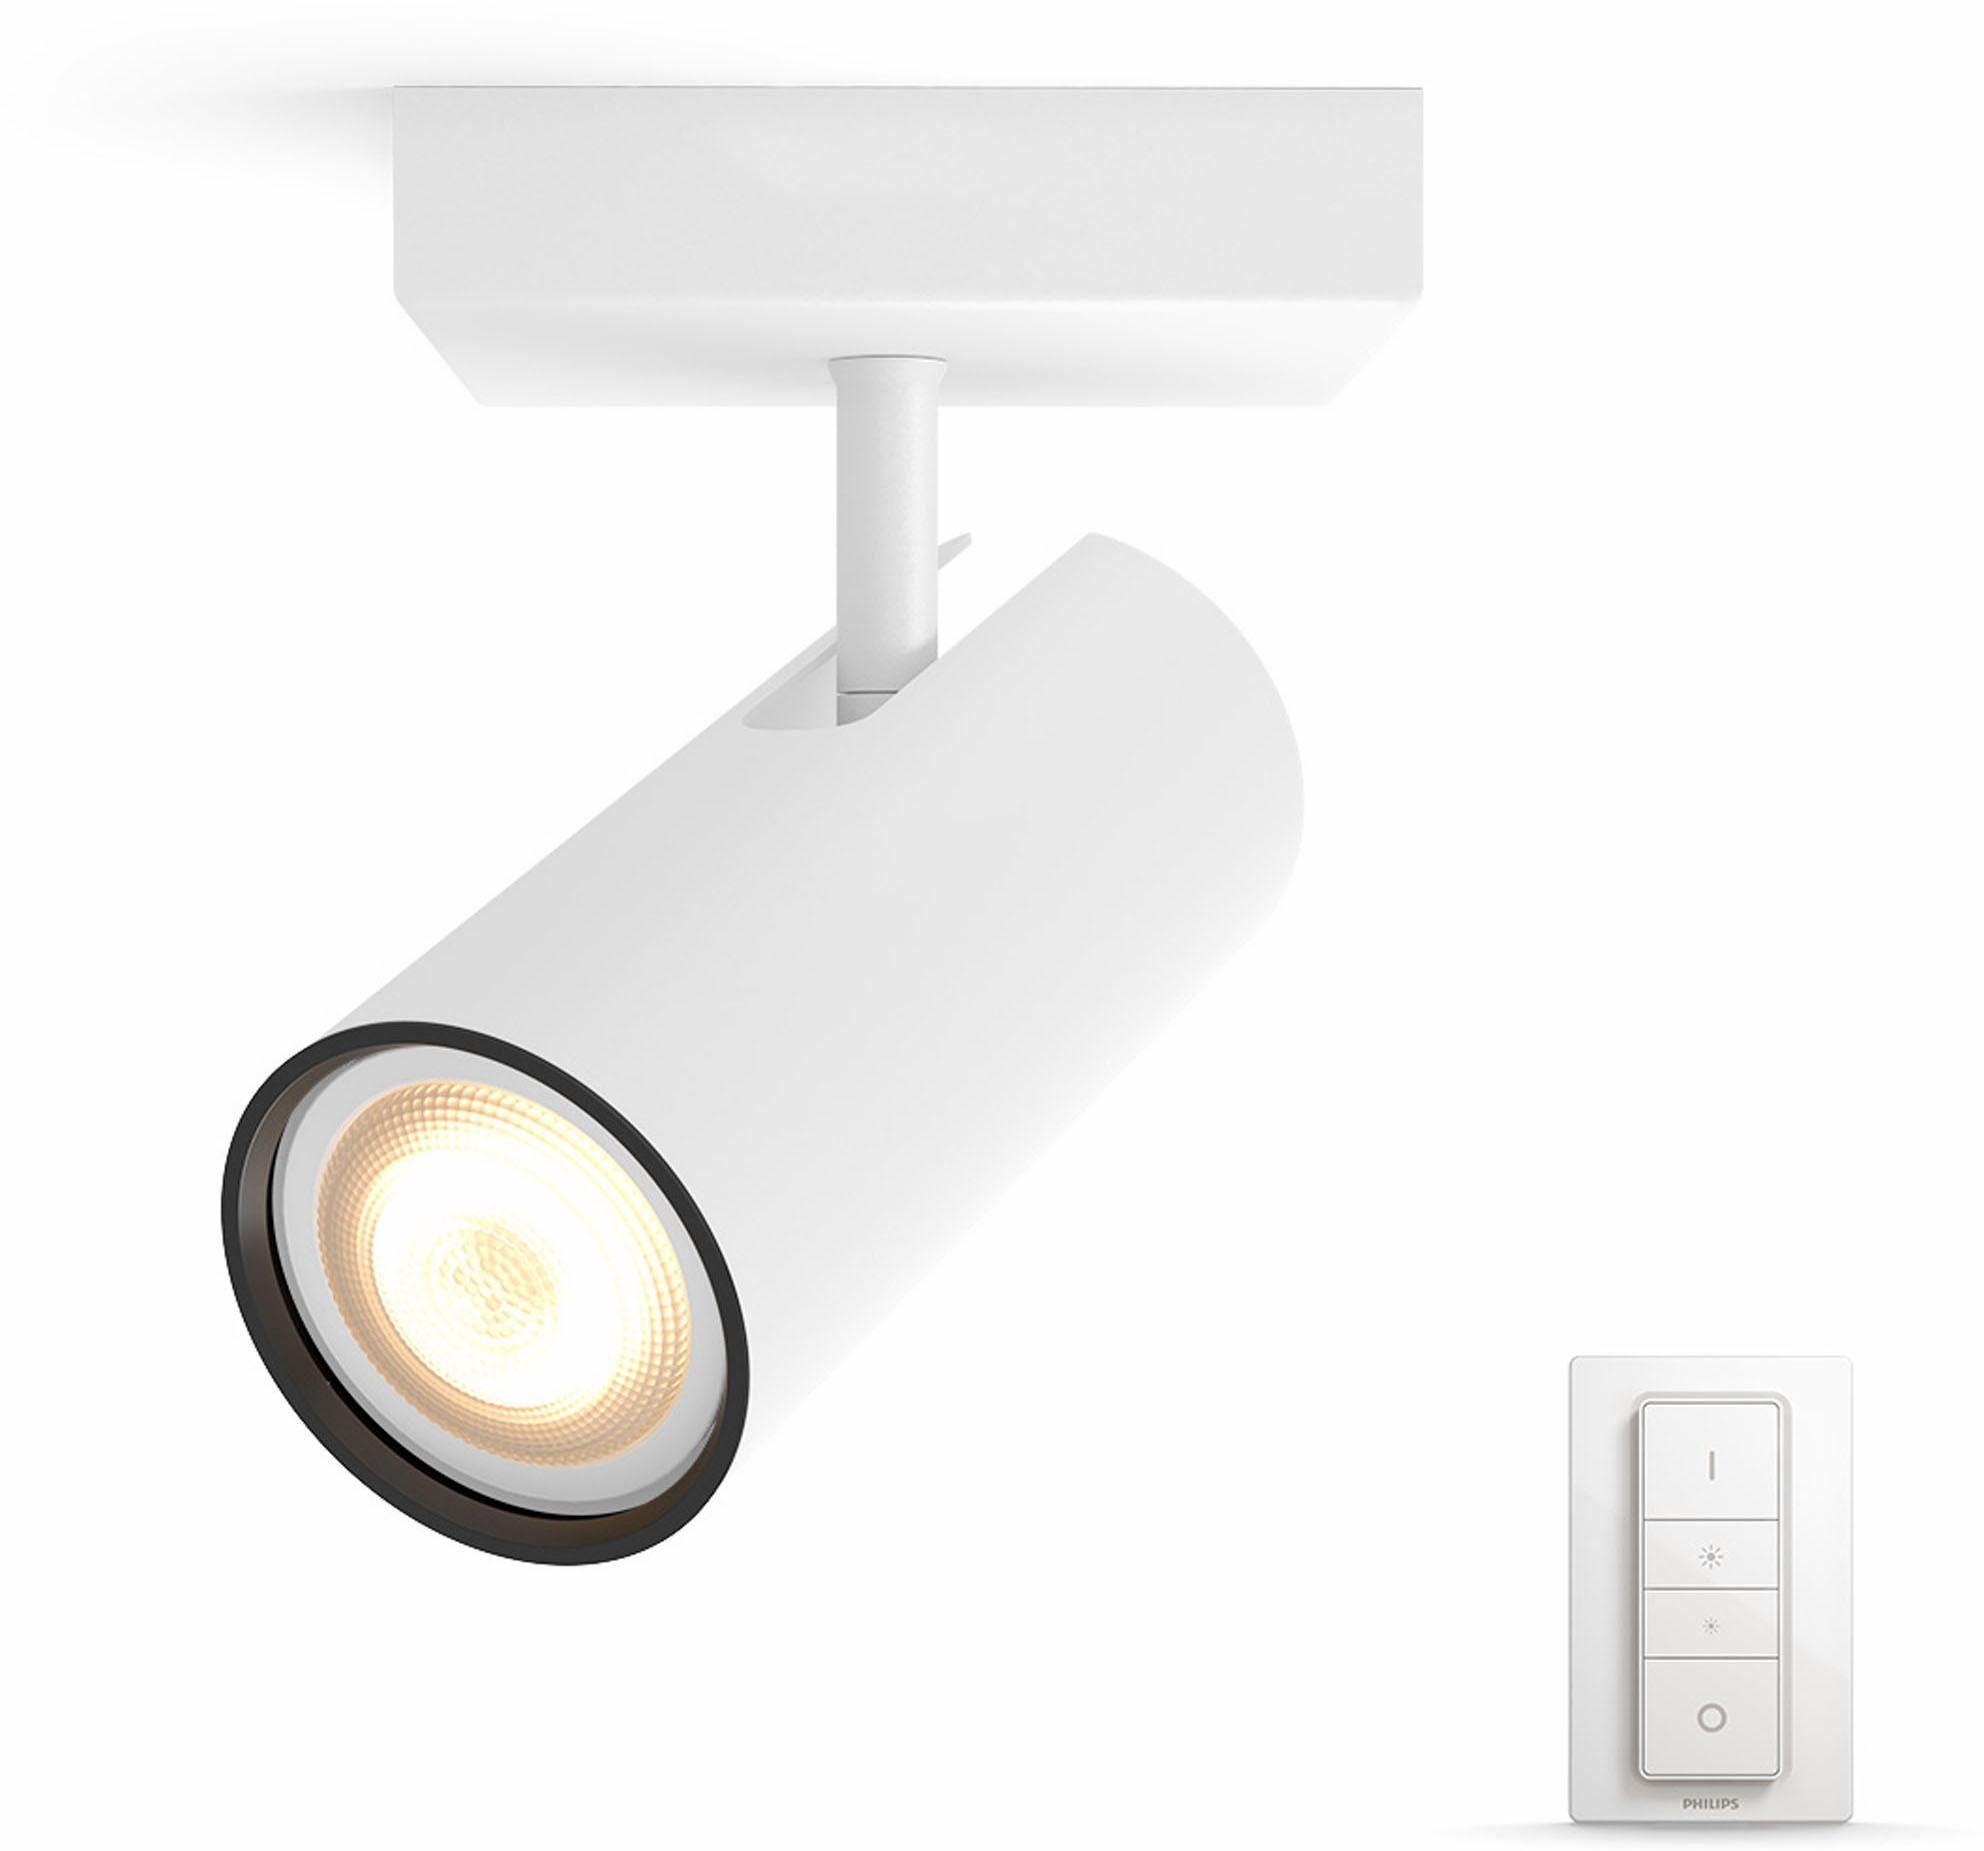 Philips Hue LED Deckenleuchte »PHOENIX« 1-flammig